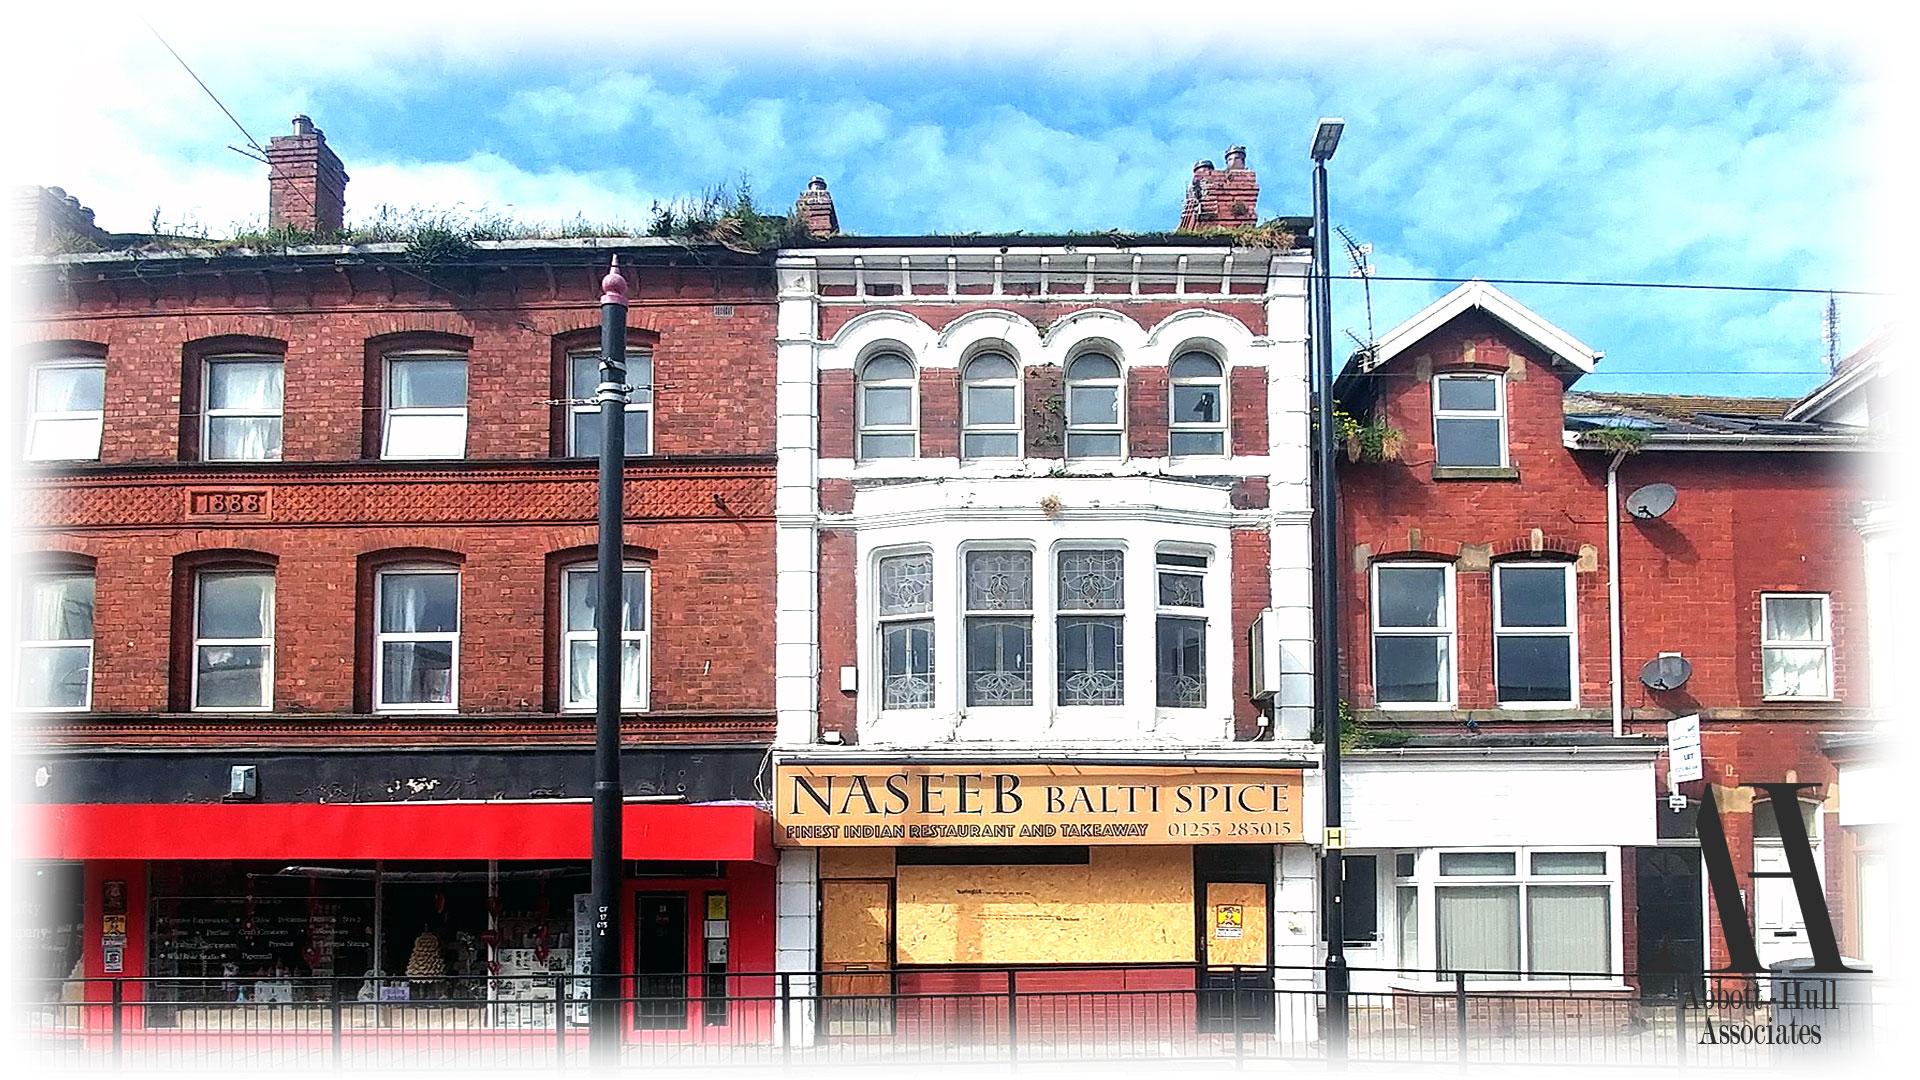 25 North Albert Street, Fleetwood - street view